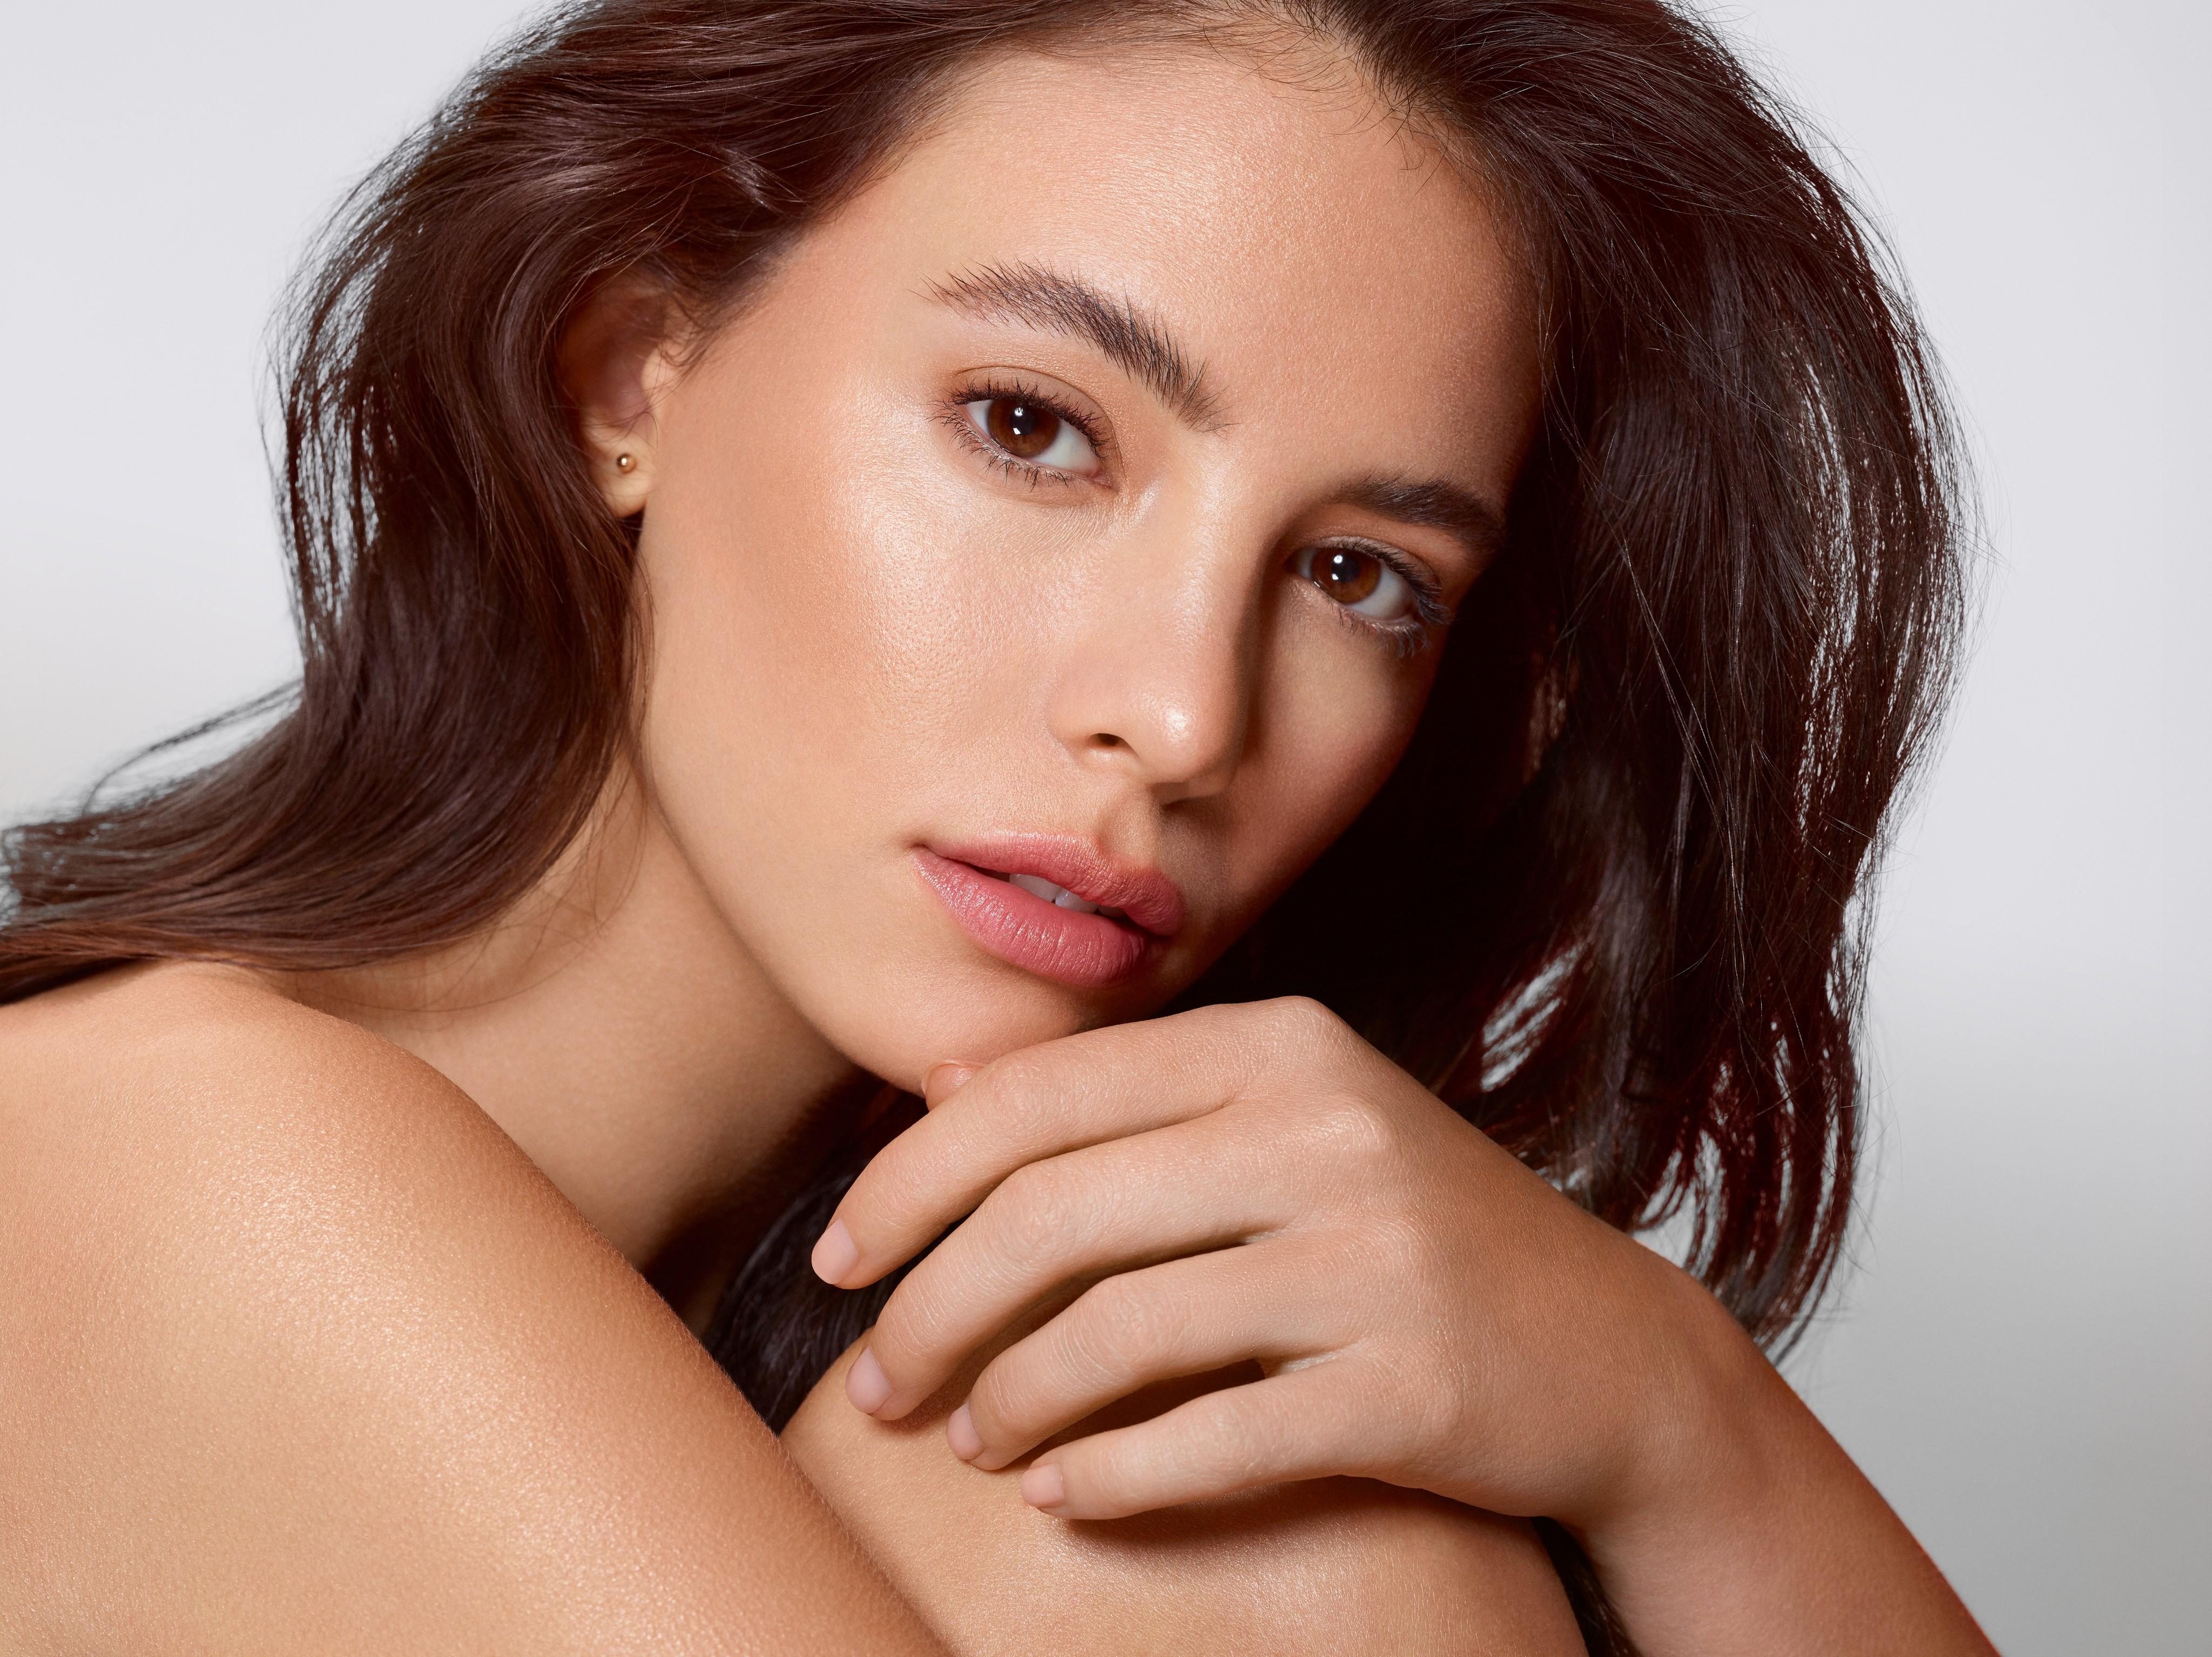 Skincare-beautyvisual-sensitive-skin-sensual-body-face-0322-Web-Rendition